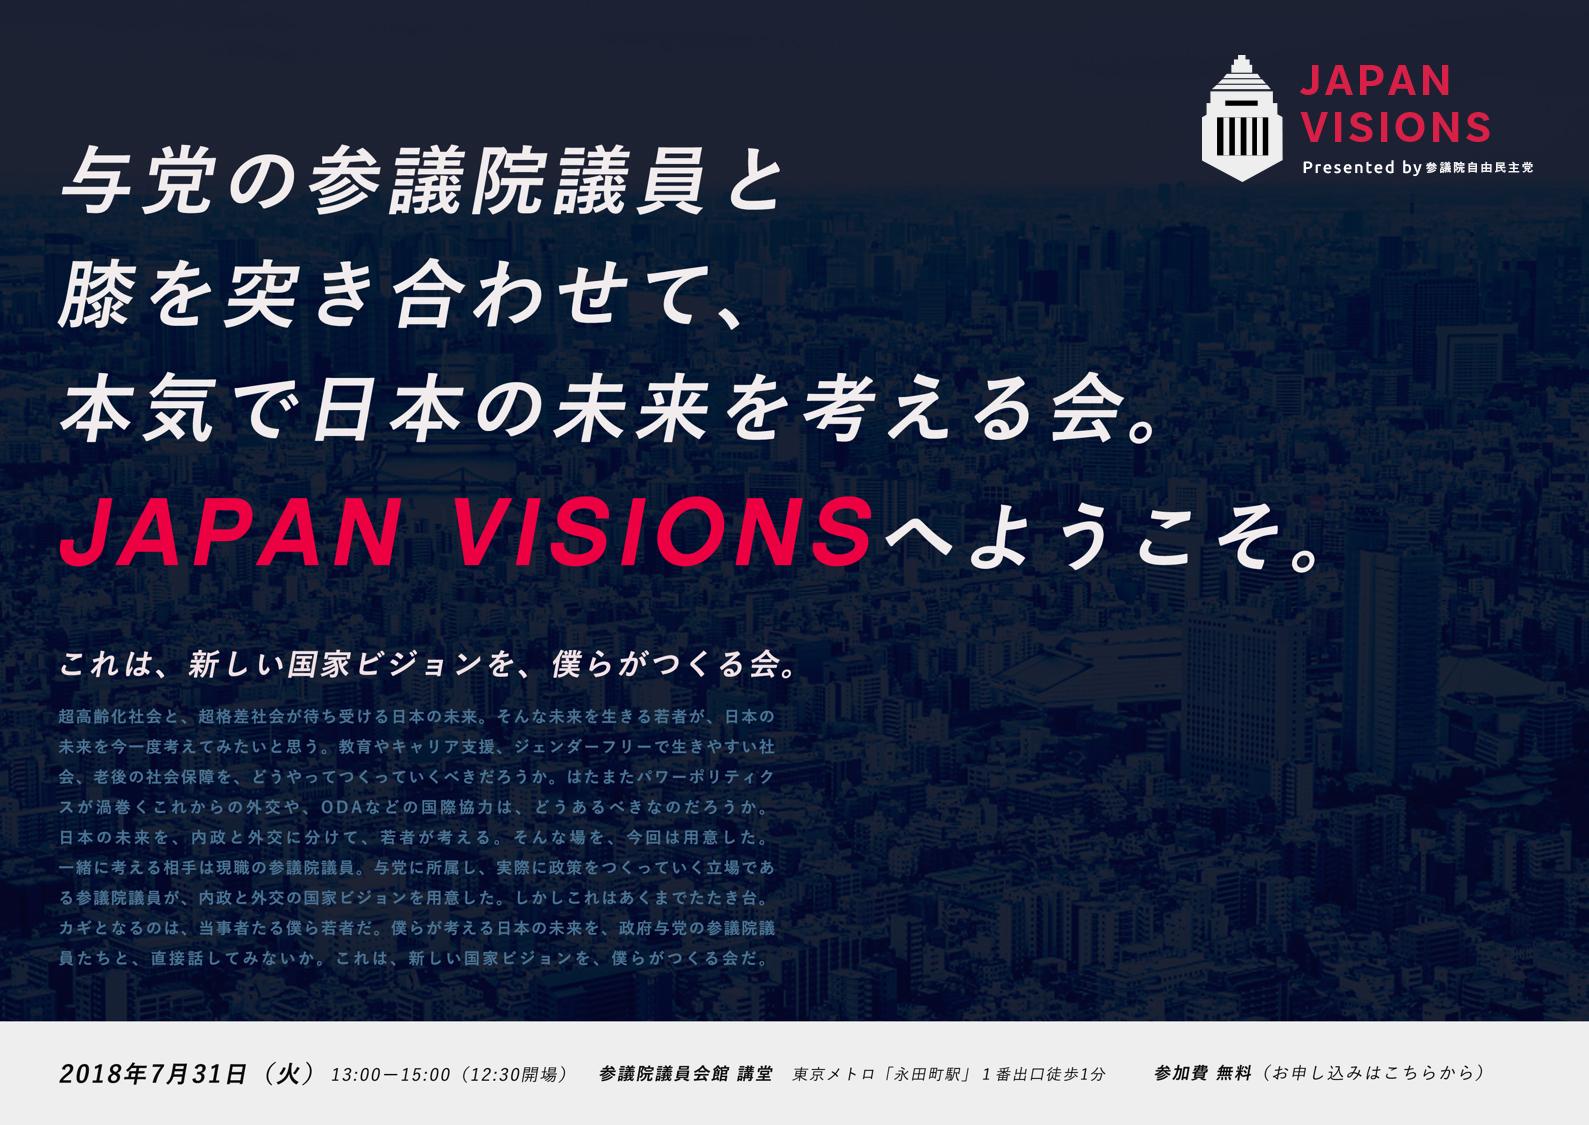 message banner - JAPAN VISIONS 大盛会でした!